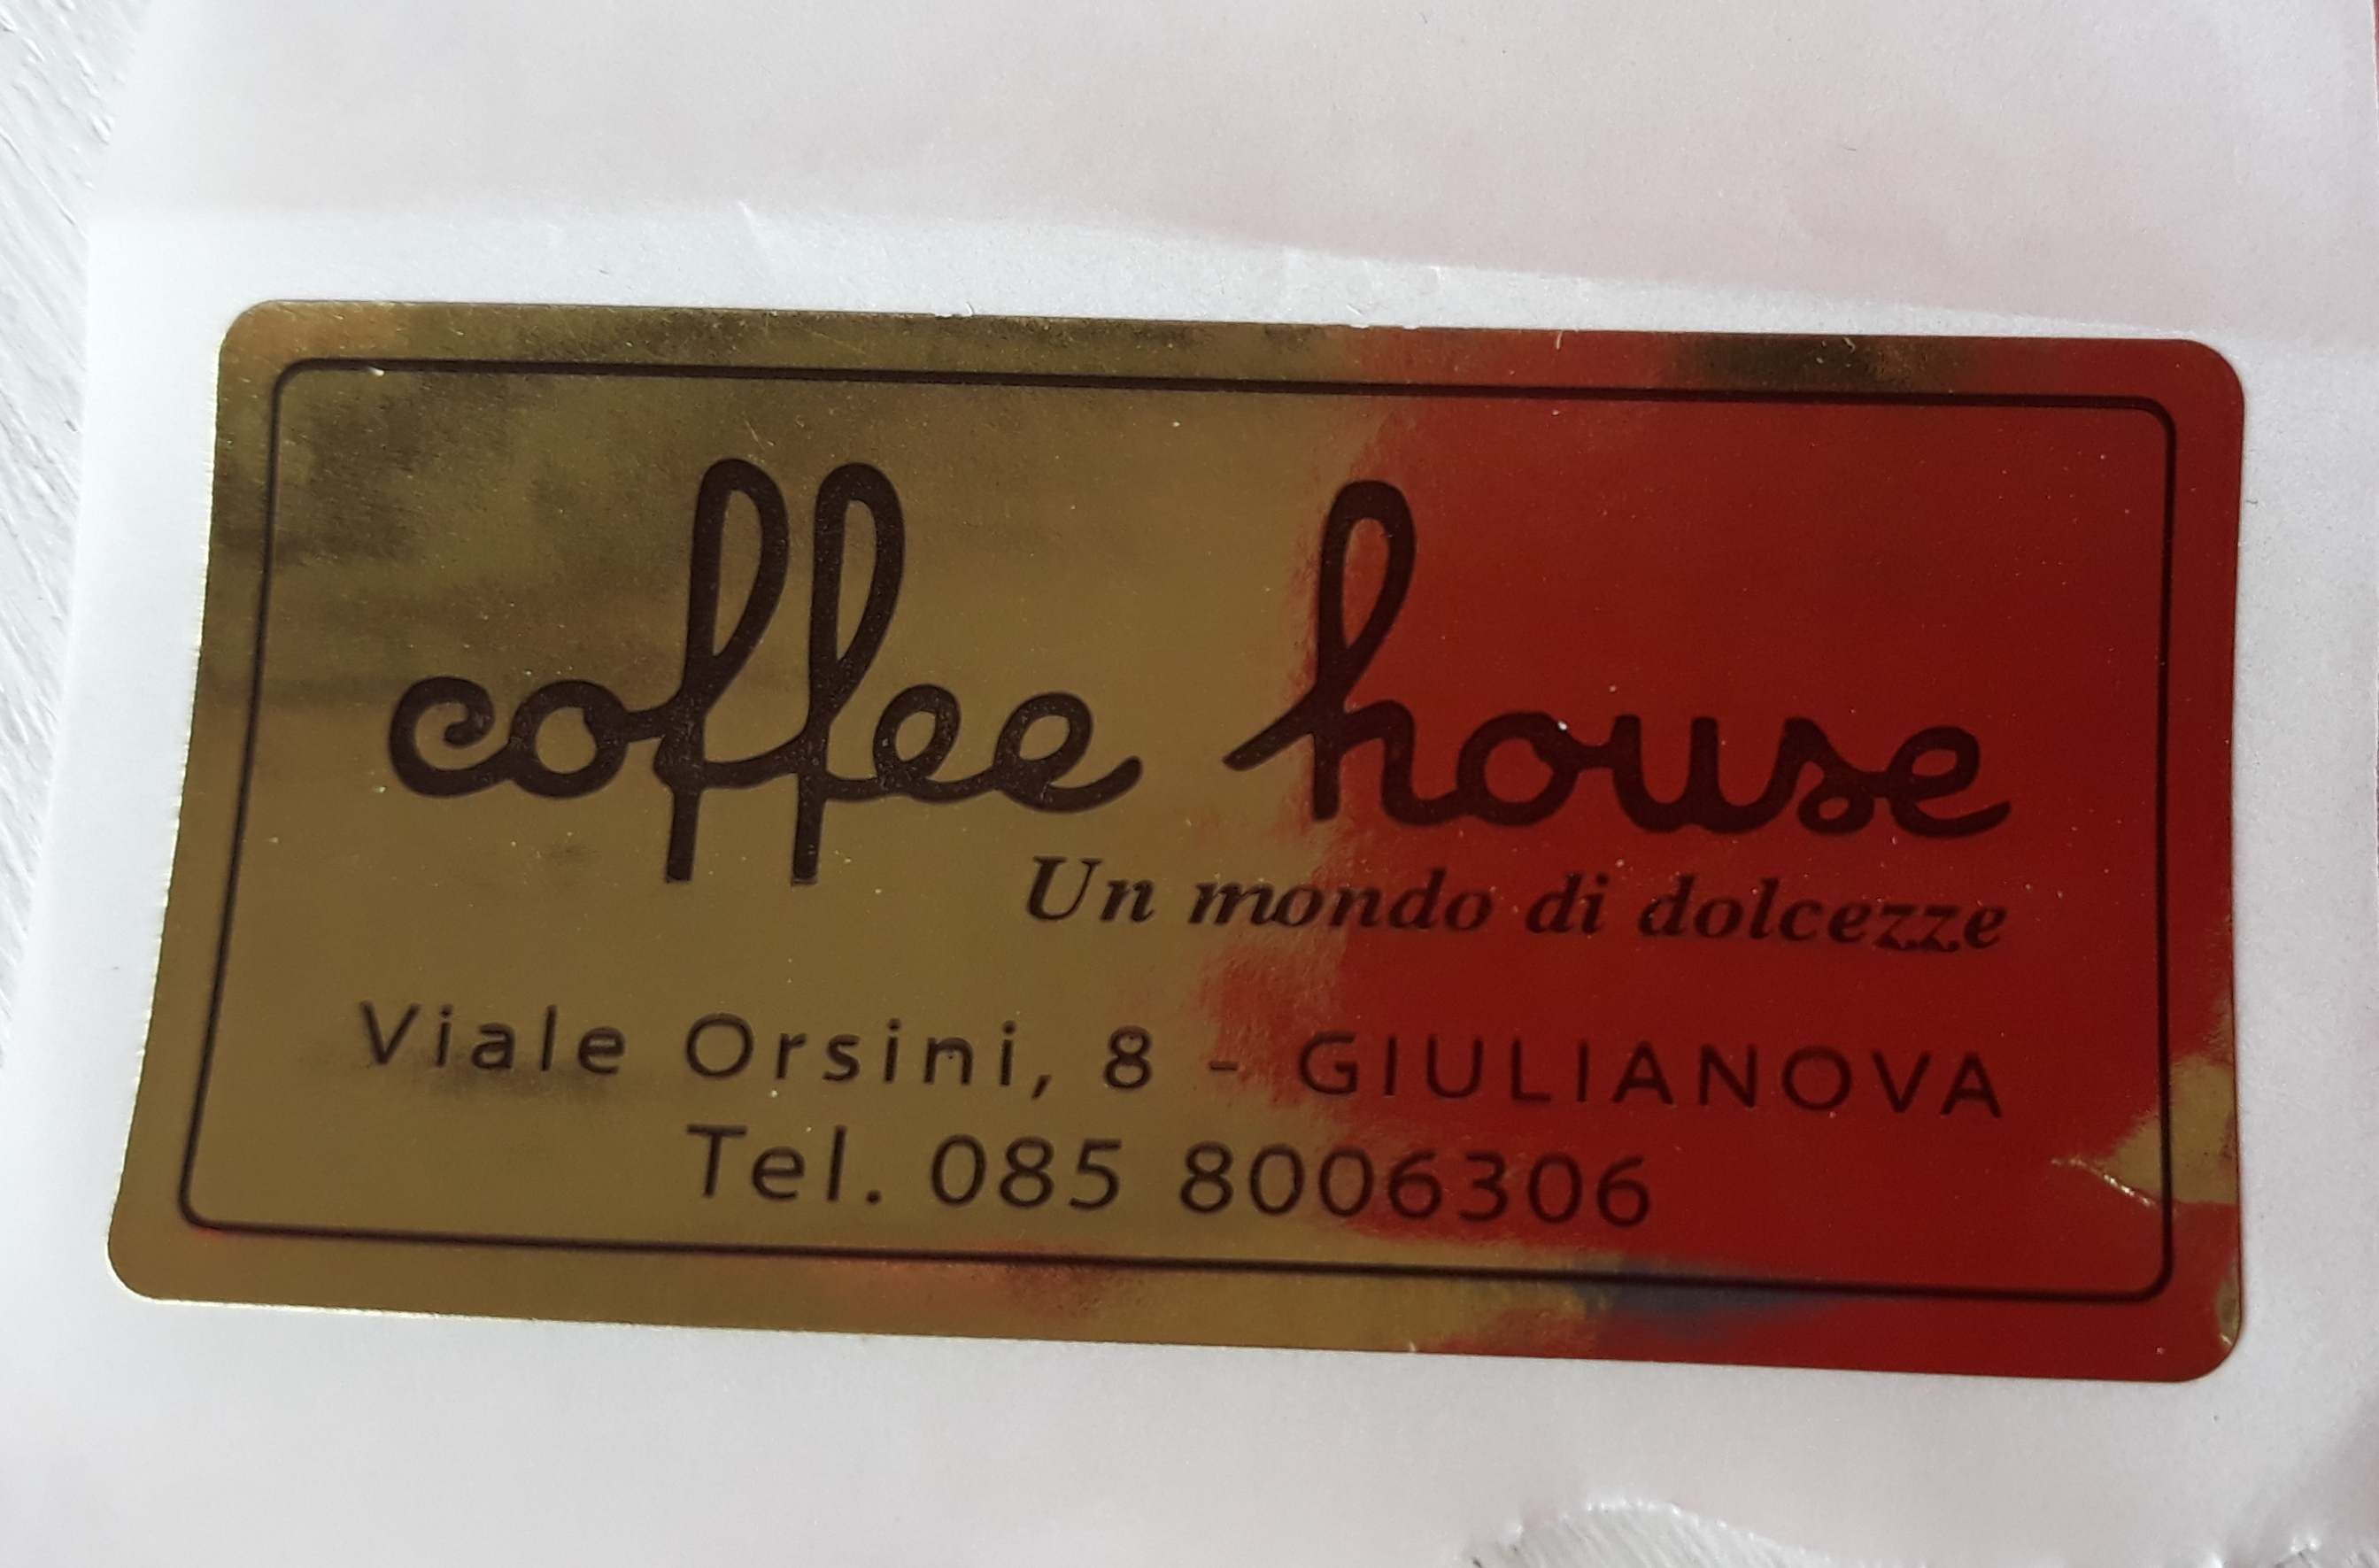 logo Appartamenti Coffee house giulianova